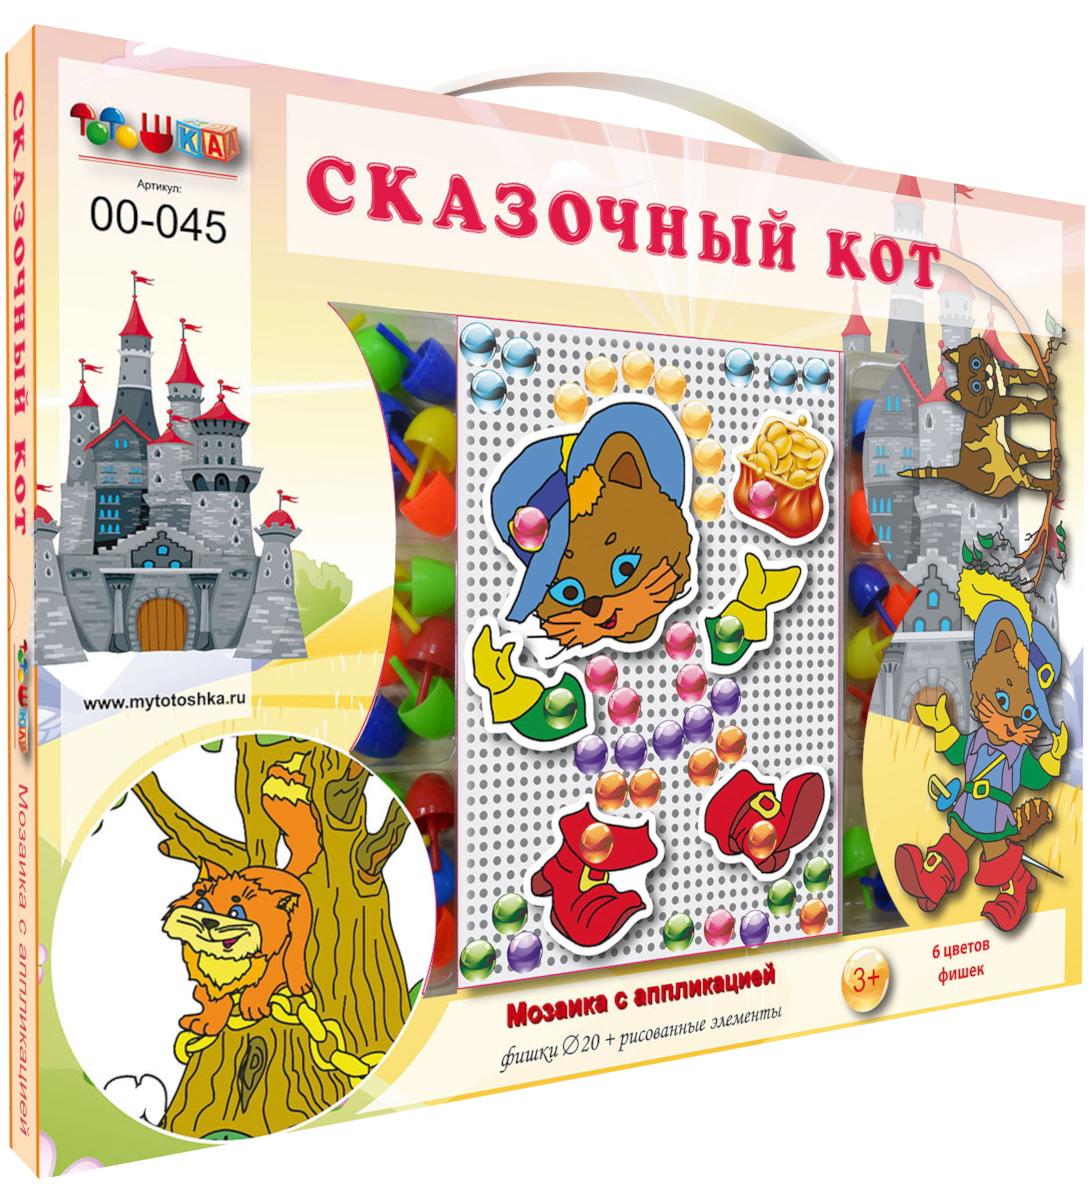 Тотошка Мозаика Сказочный кот тотошка мозаика сказочный замок